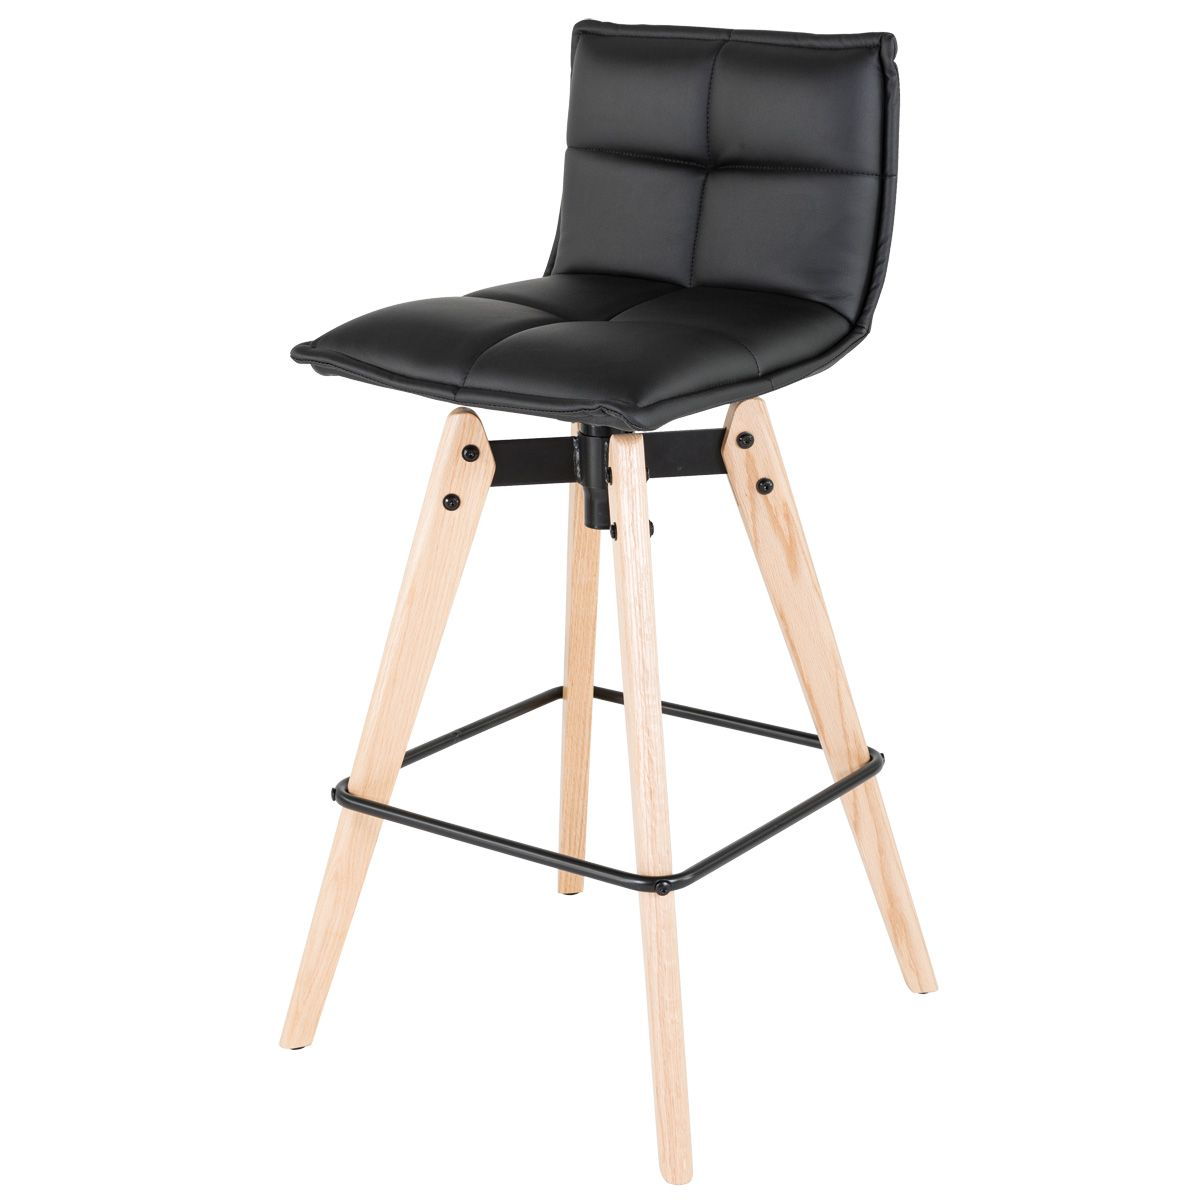 Chaise de bar design  noir